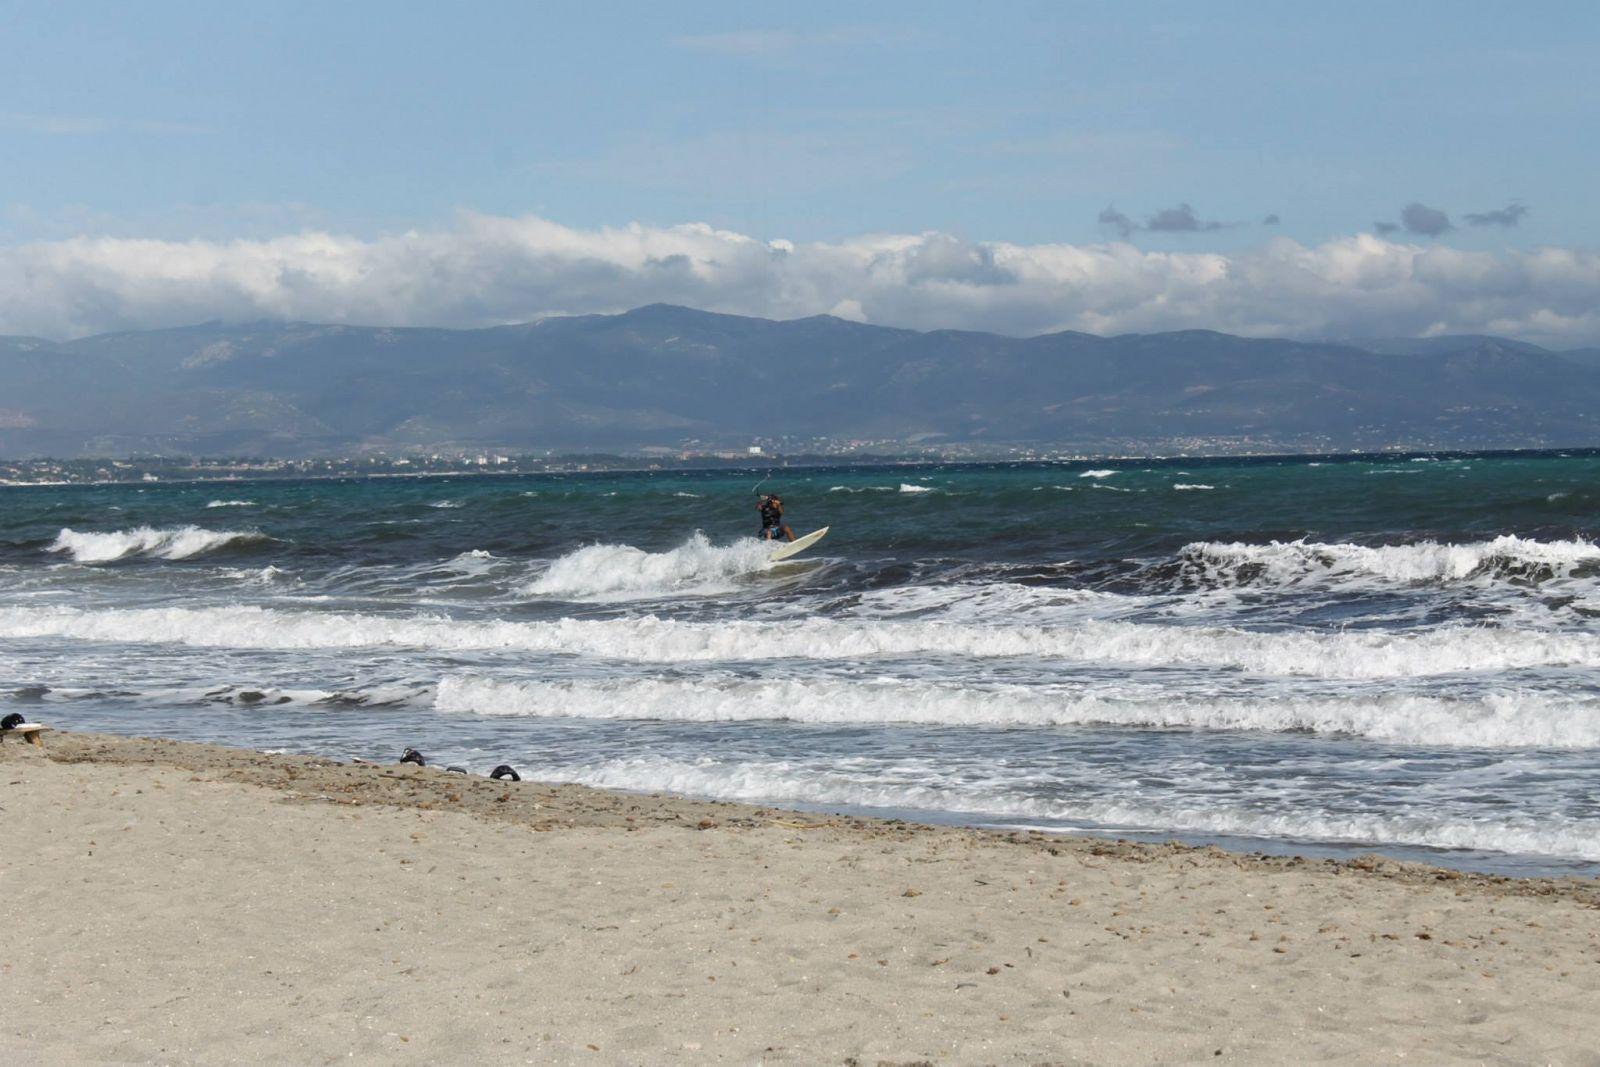 Sardynia Porto Botte windsurfing kitesurfing